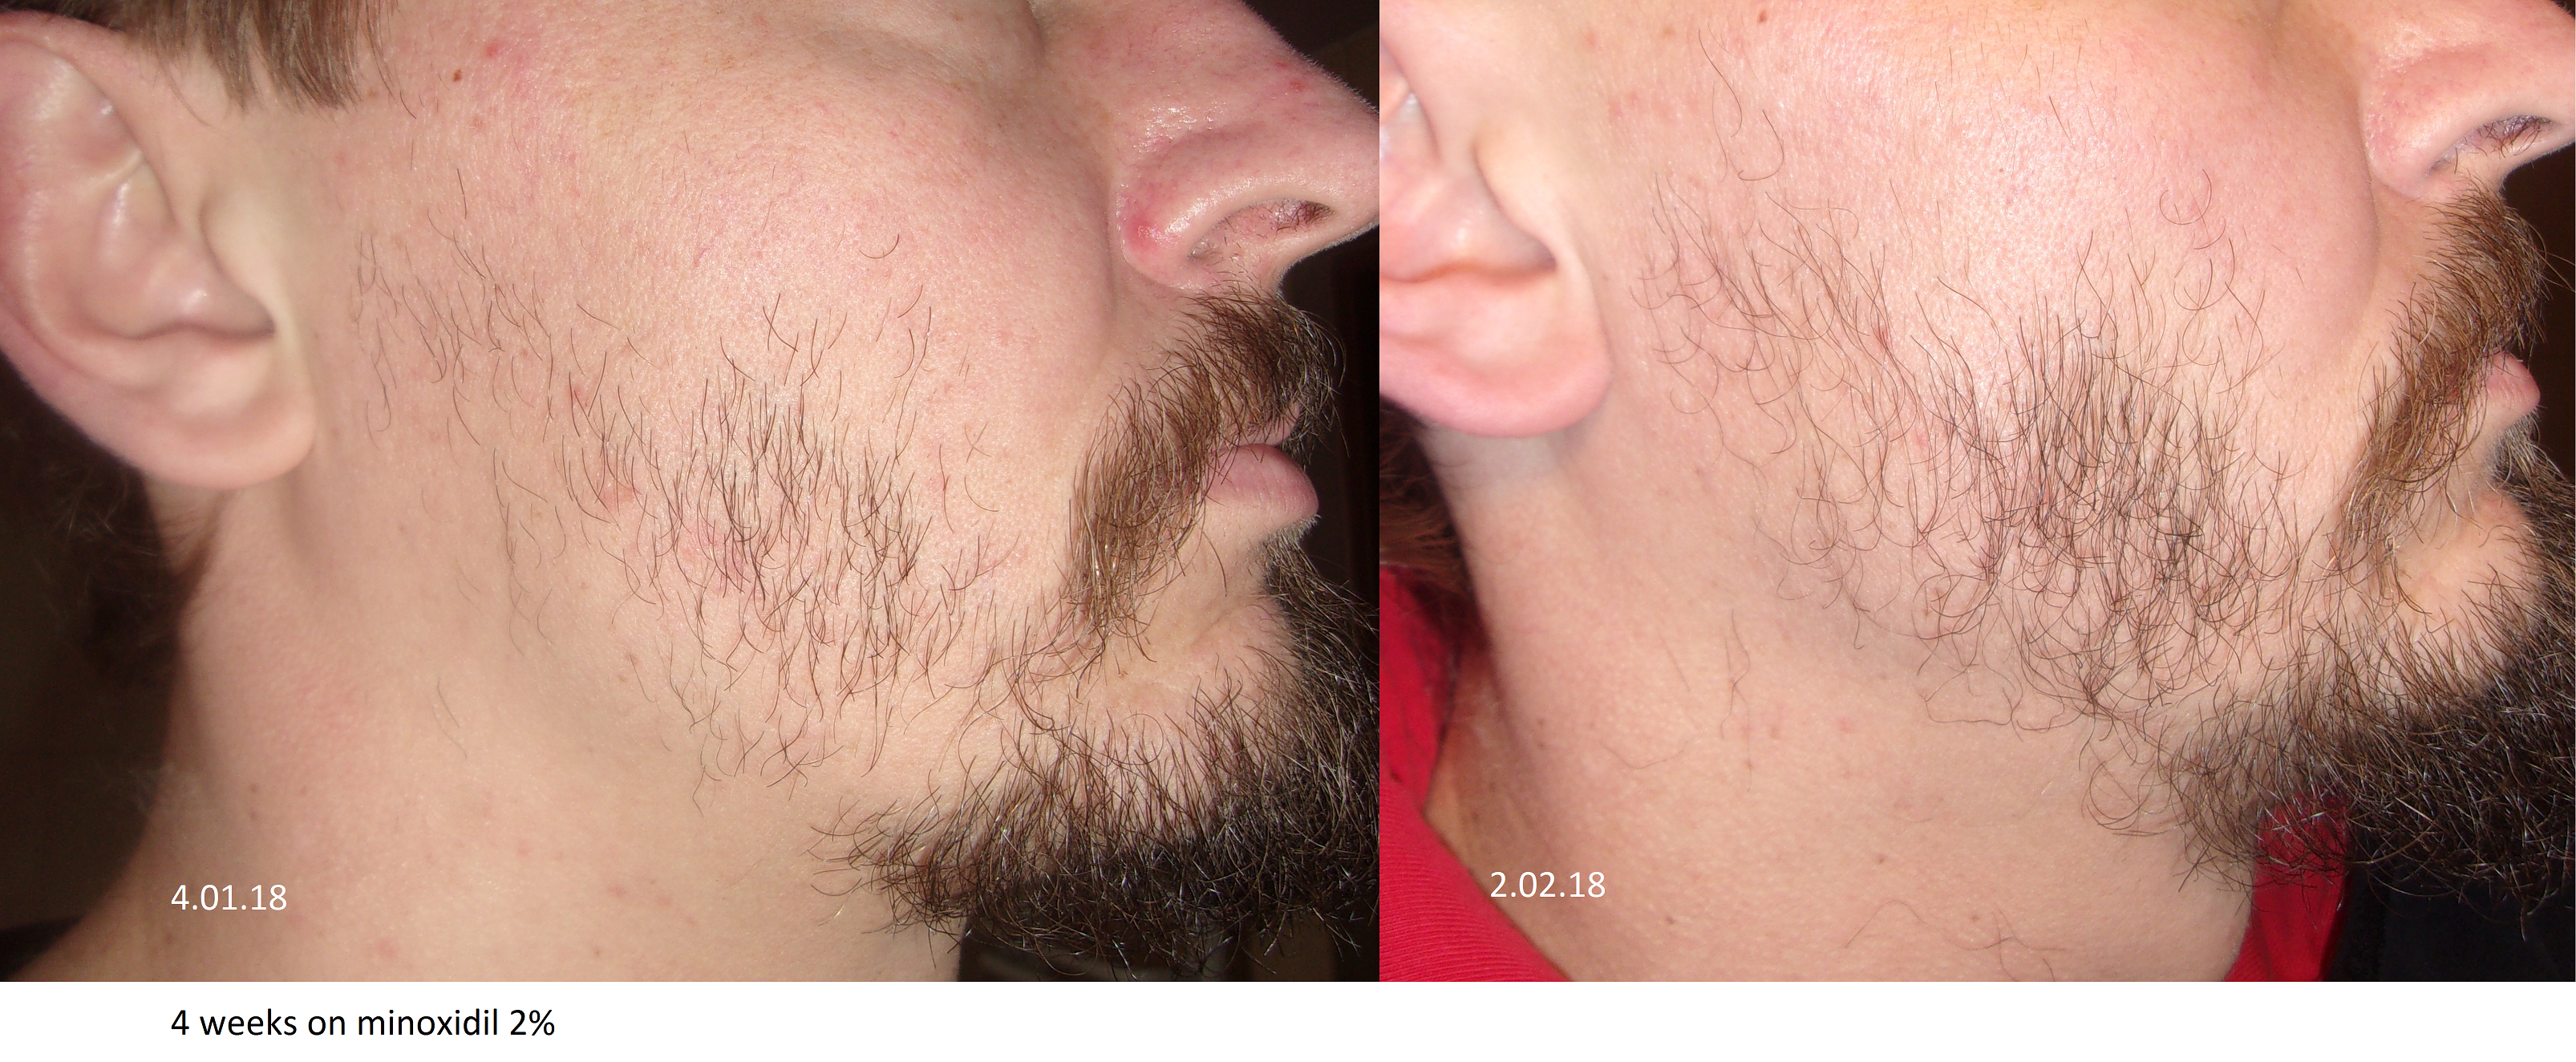 minoxidil 2% beard journey at Beard Profile Forum